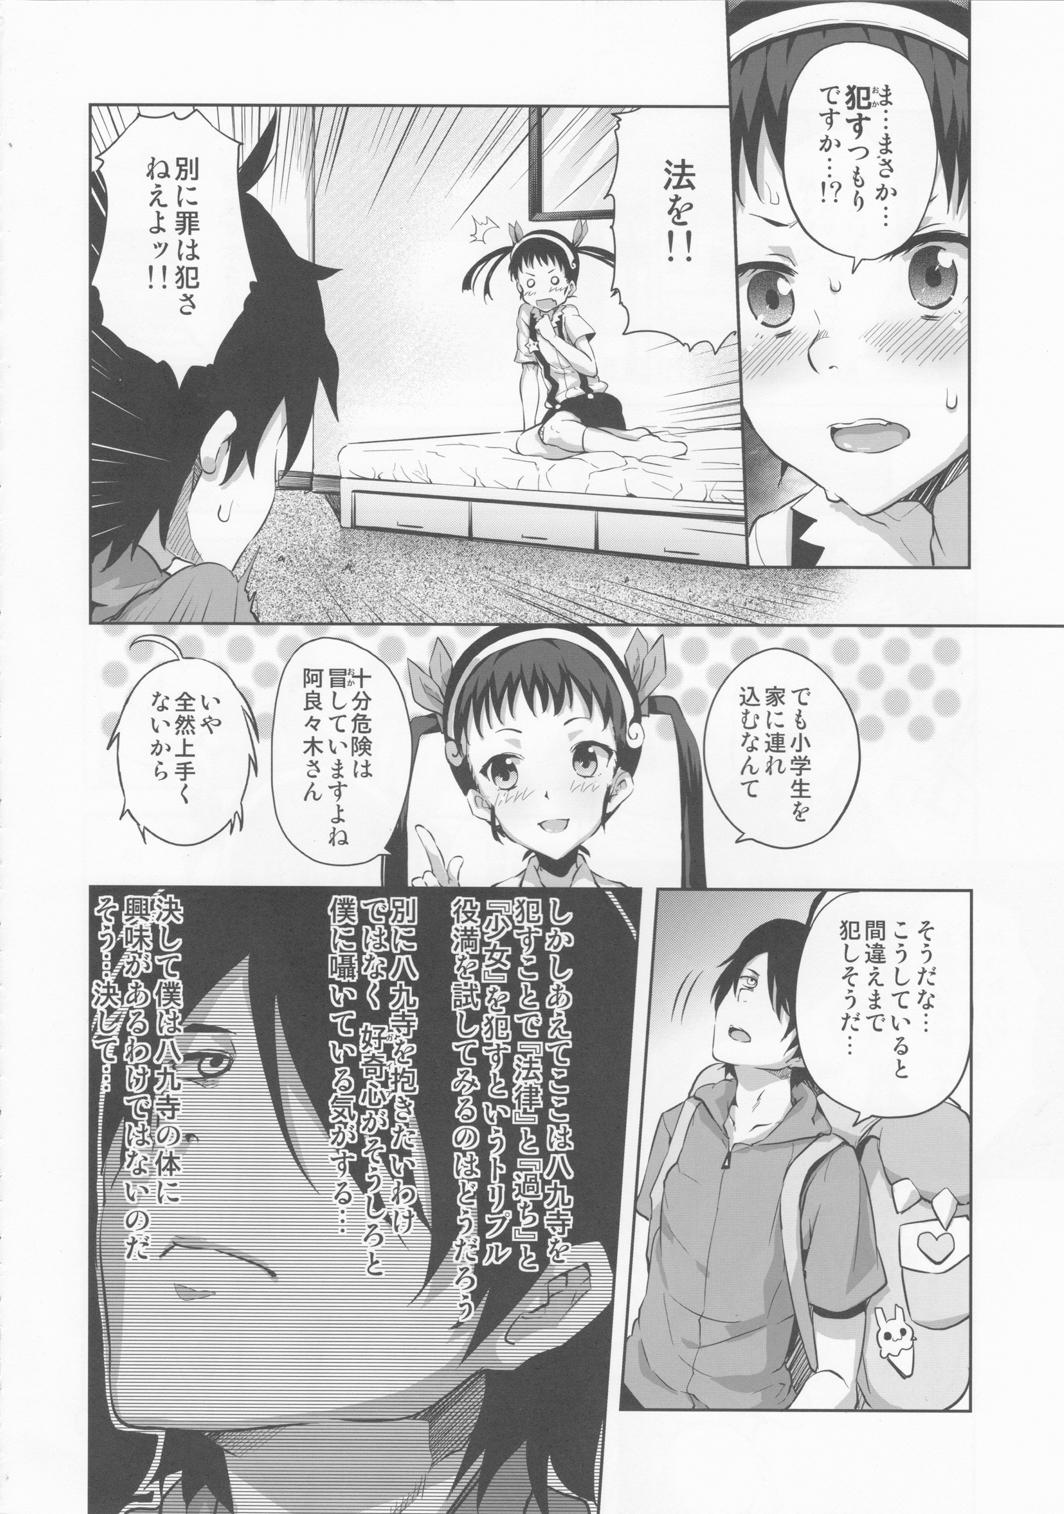 Namekuji Mayoigatari 4